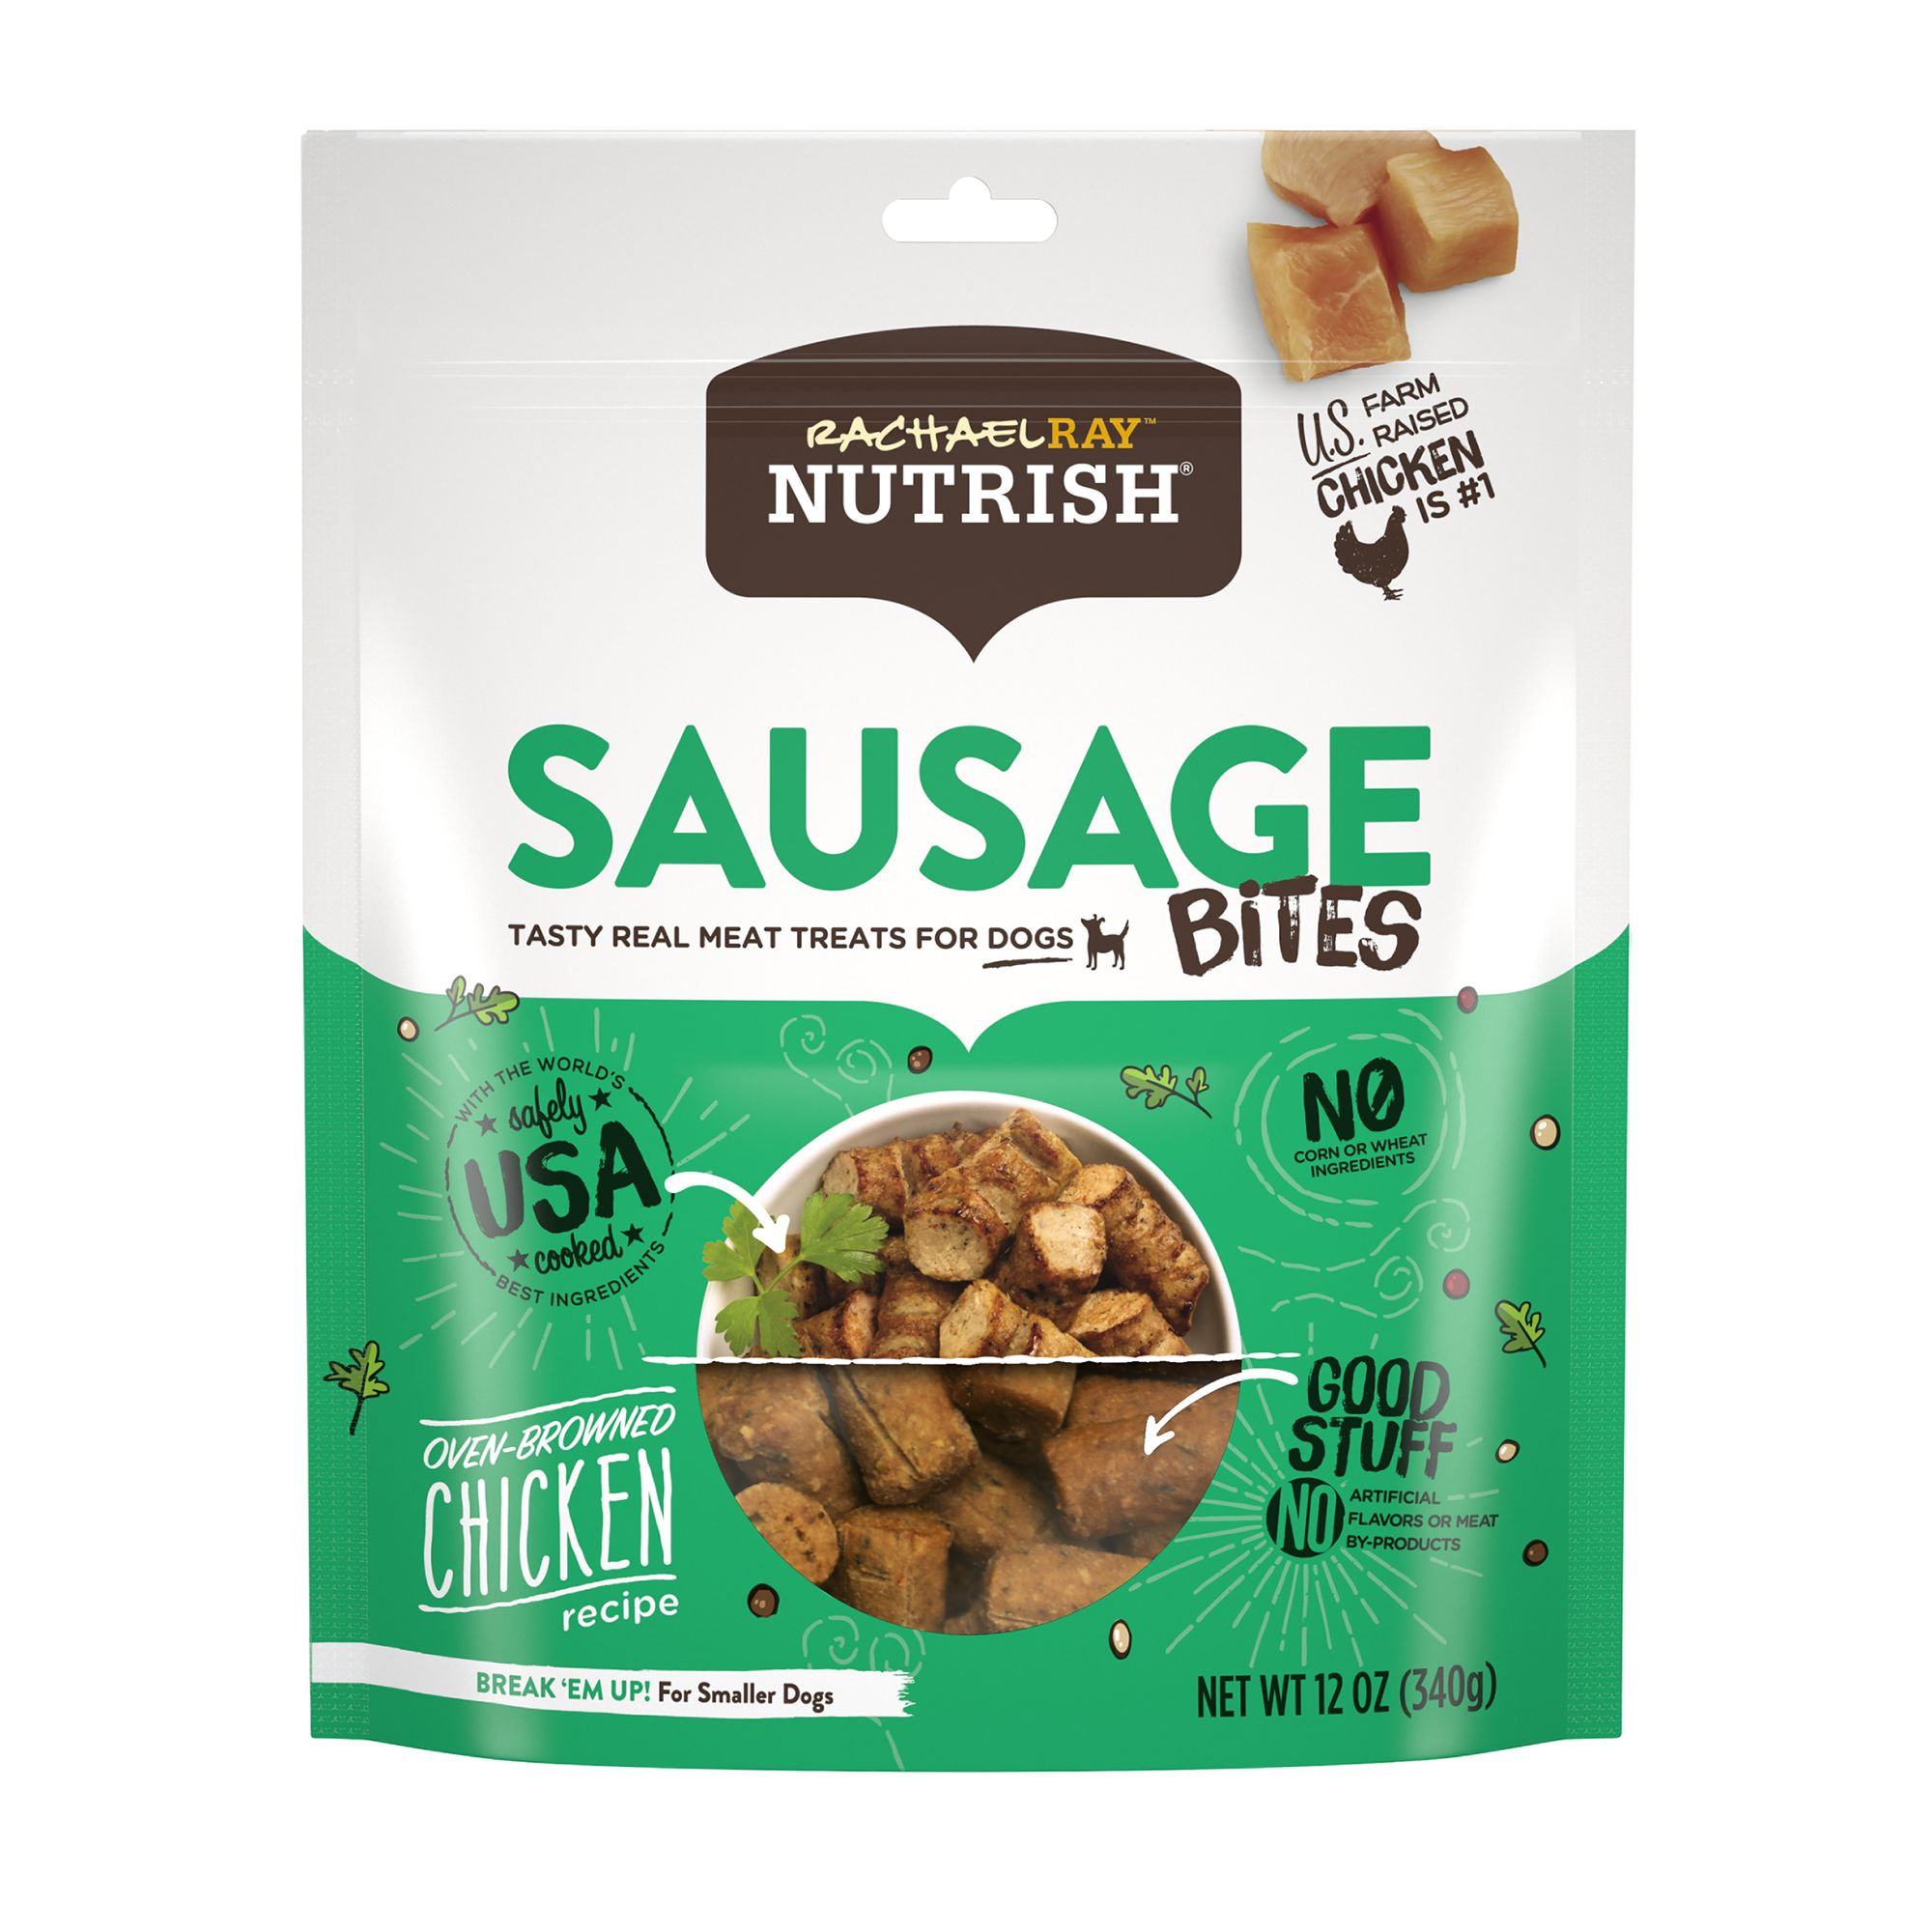 Rachael Ray, Nutrish Sausage Bites Dog Treat - Chicken Recipe size: 12 Oz, Rachael Ray Nutrish 5278090